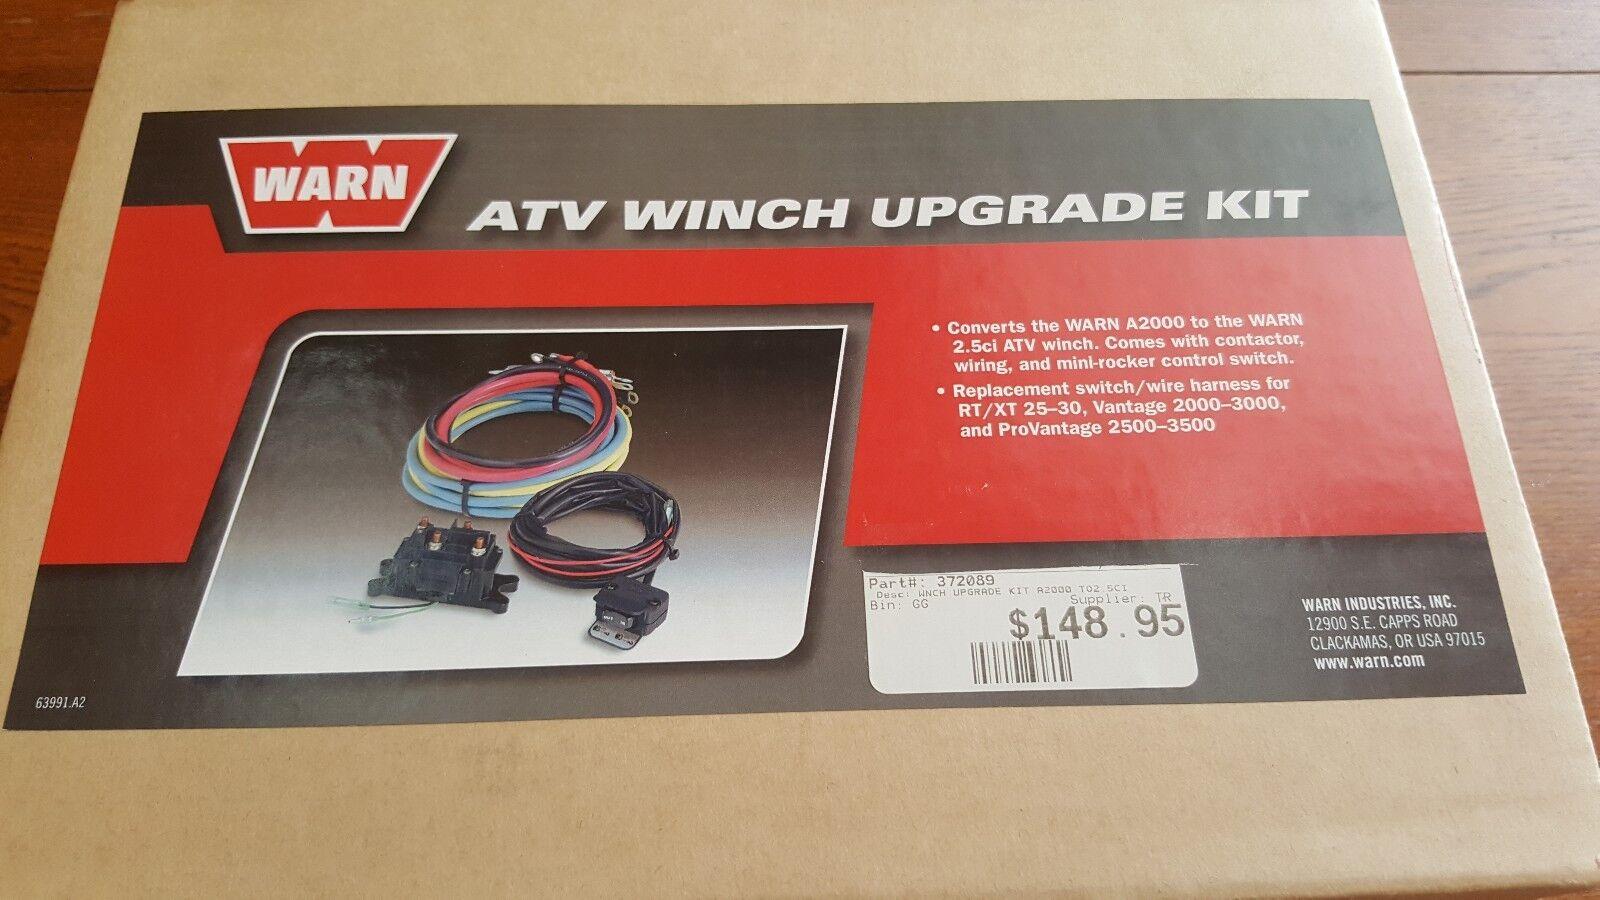 WARN Winch Upgrade Kit W63990 on